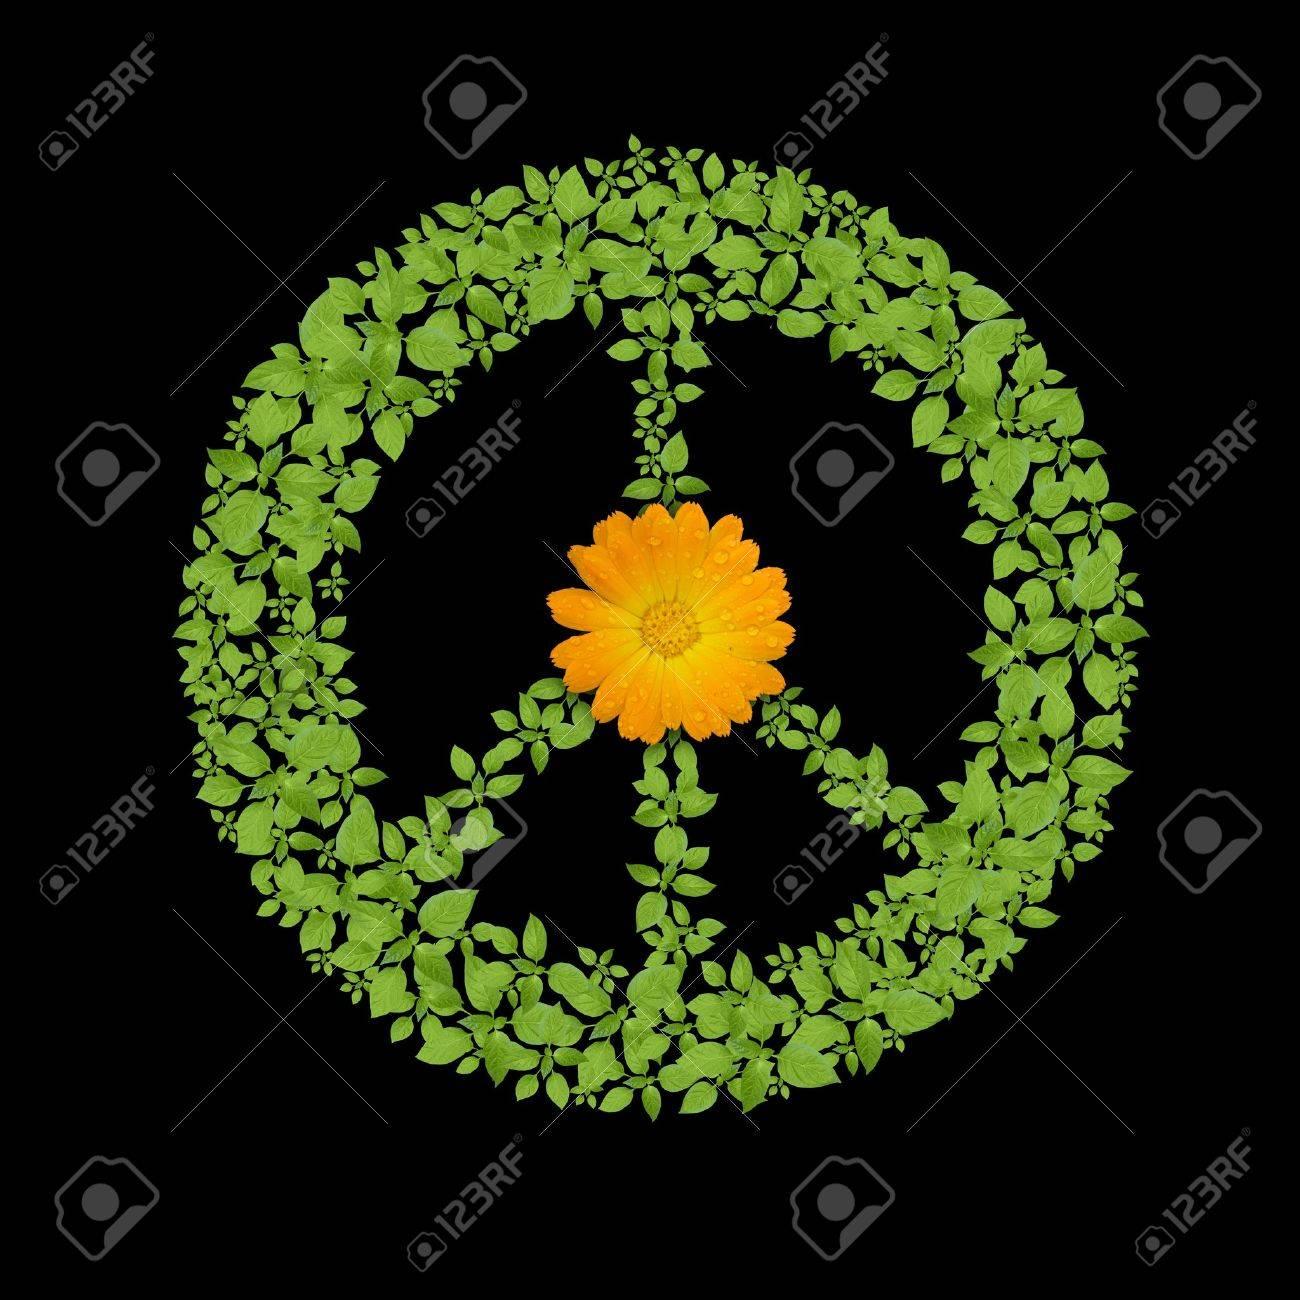 Green plant peace symbol Stock Photo - 10526395